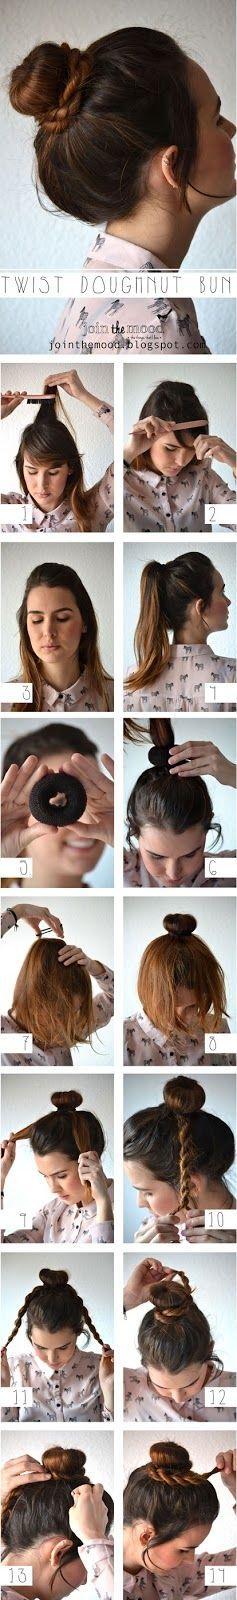 How To Make Twist Doughnut Bun For Your Hair   Shes Beautiful